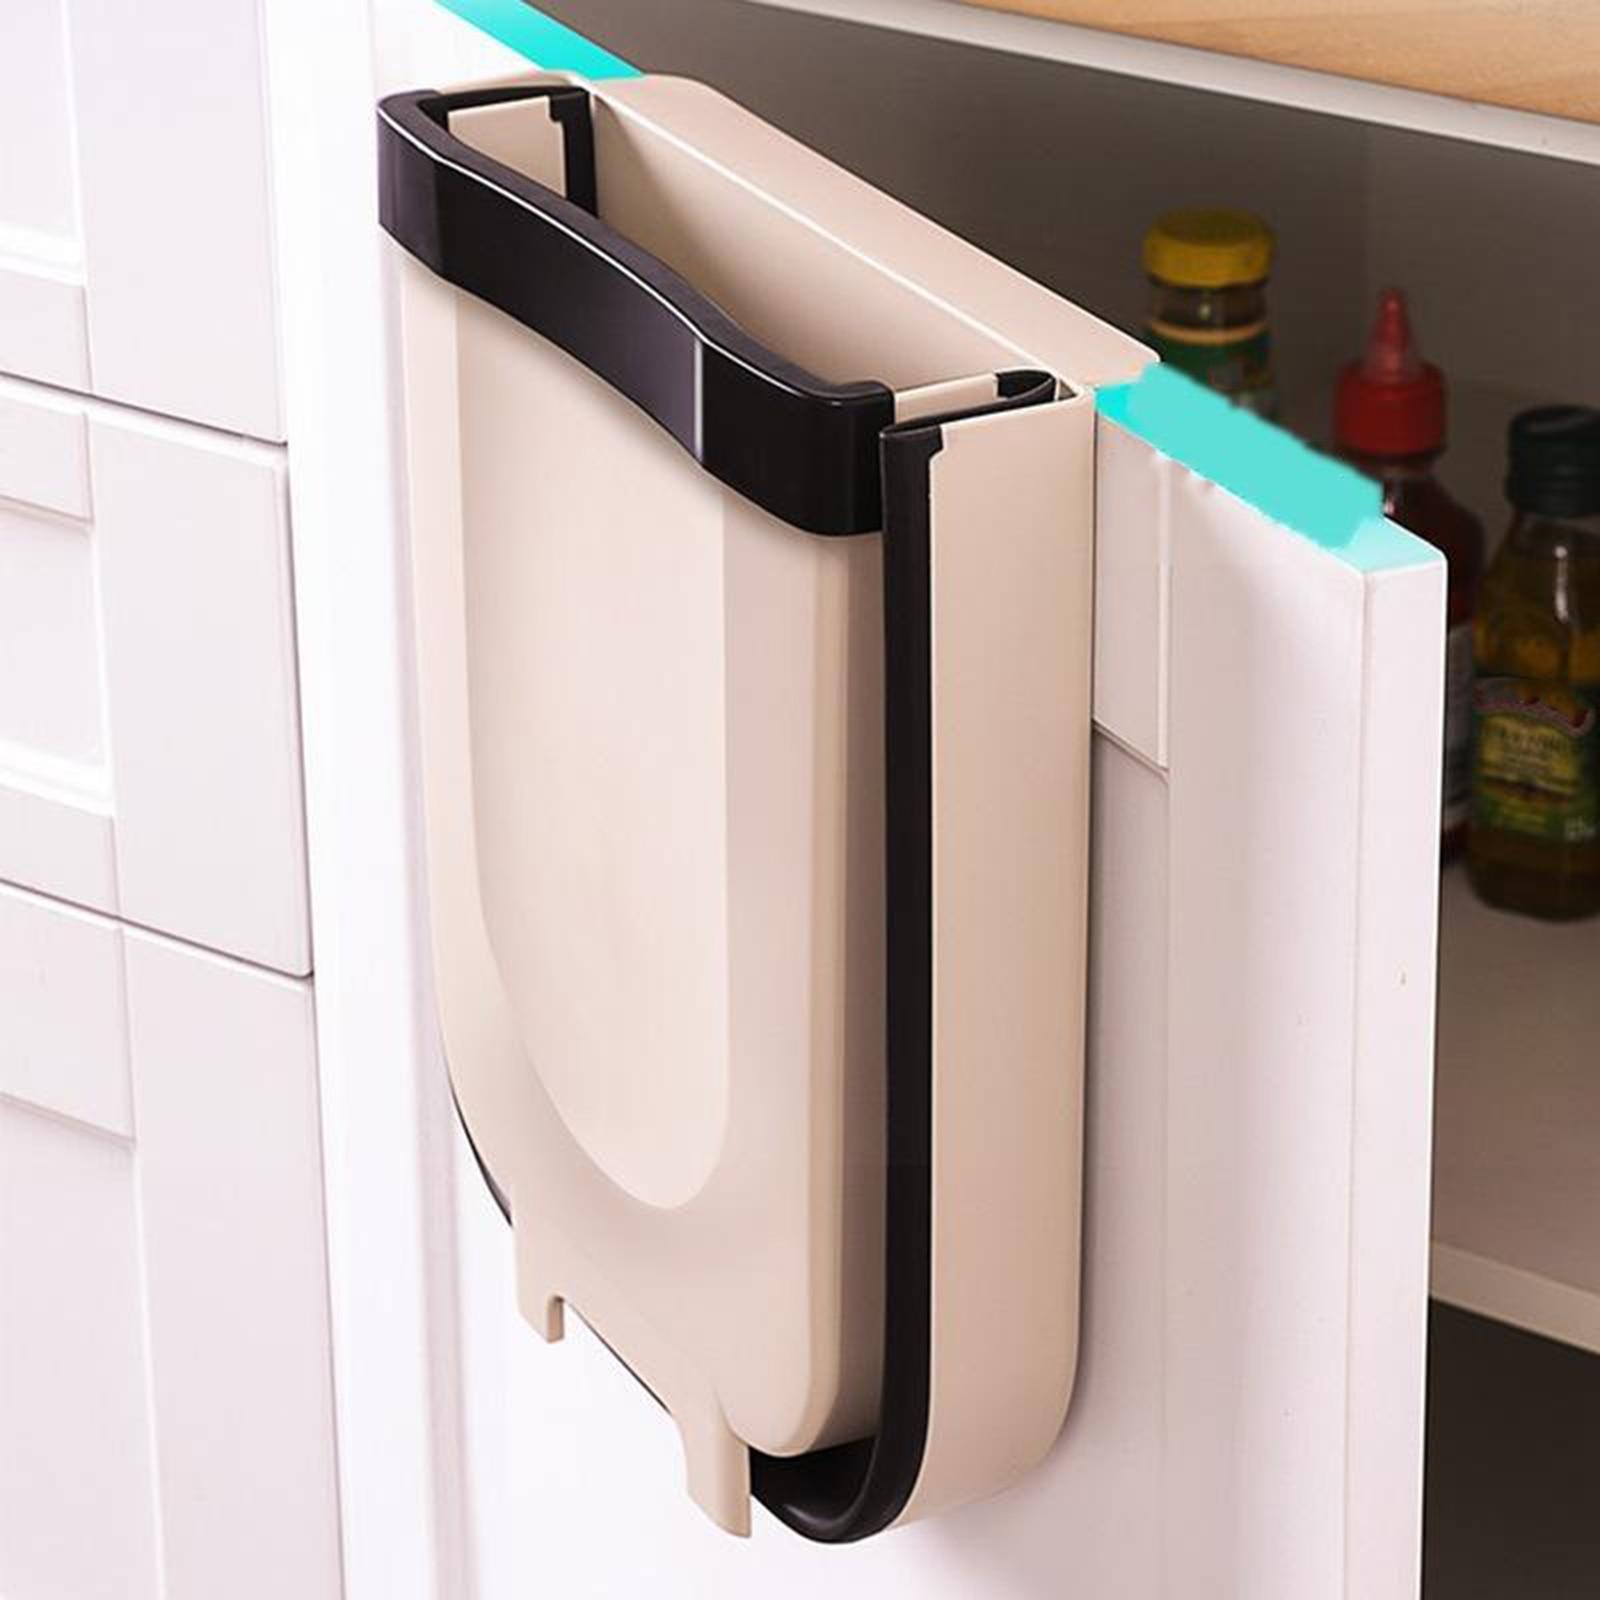 Wall Hanging Trash Can Wastebasket Folding Recycling Bin Kitchen Cabinet 10L